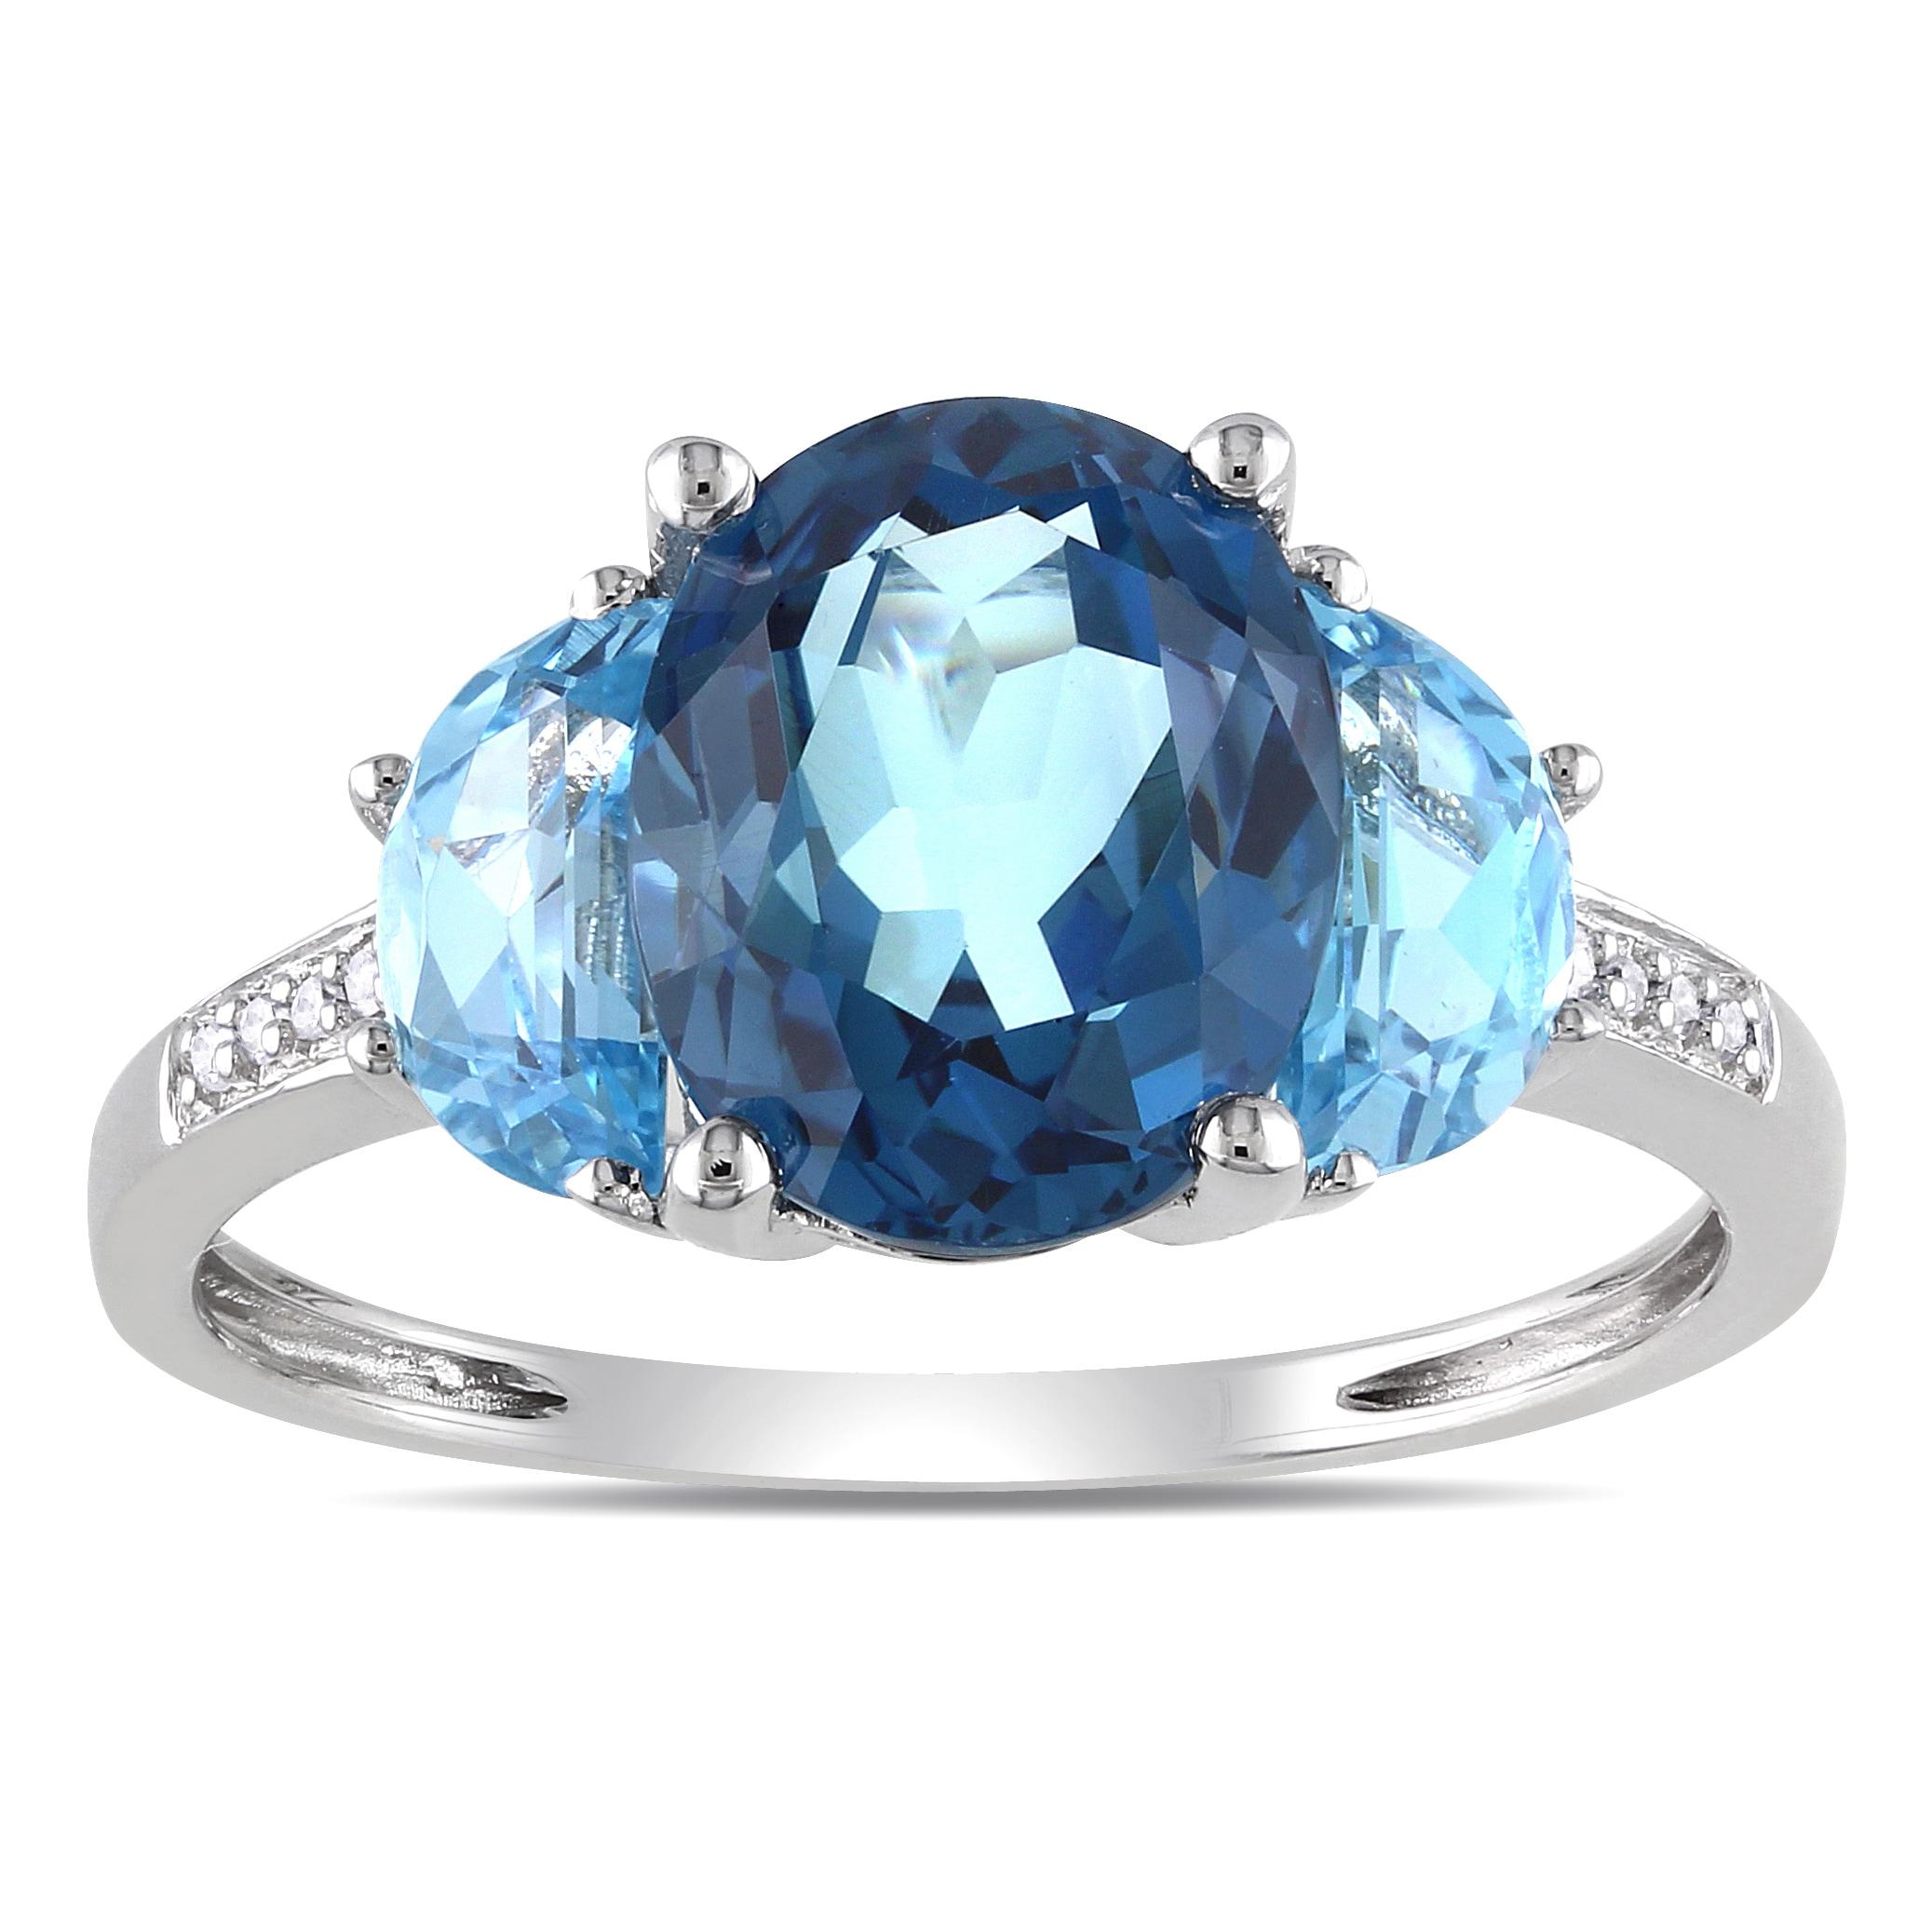 925 Silver London Blue Topaz /& Diamond Accent Square Ring Size 5